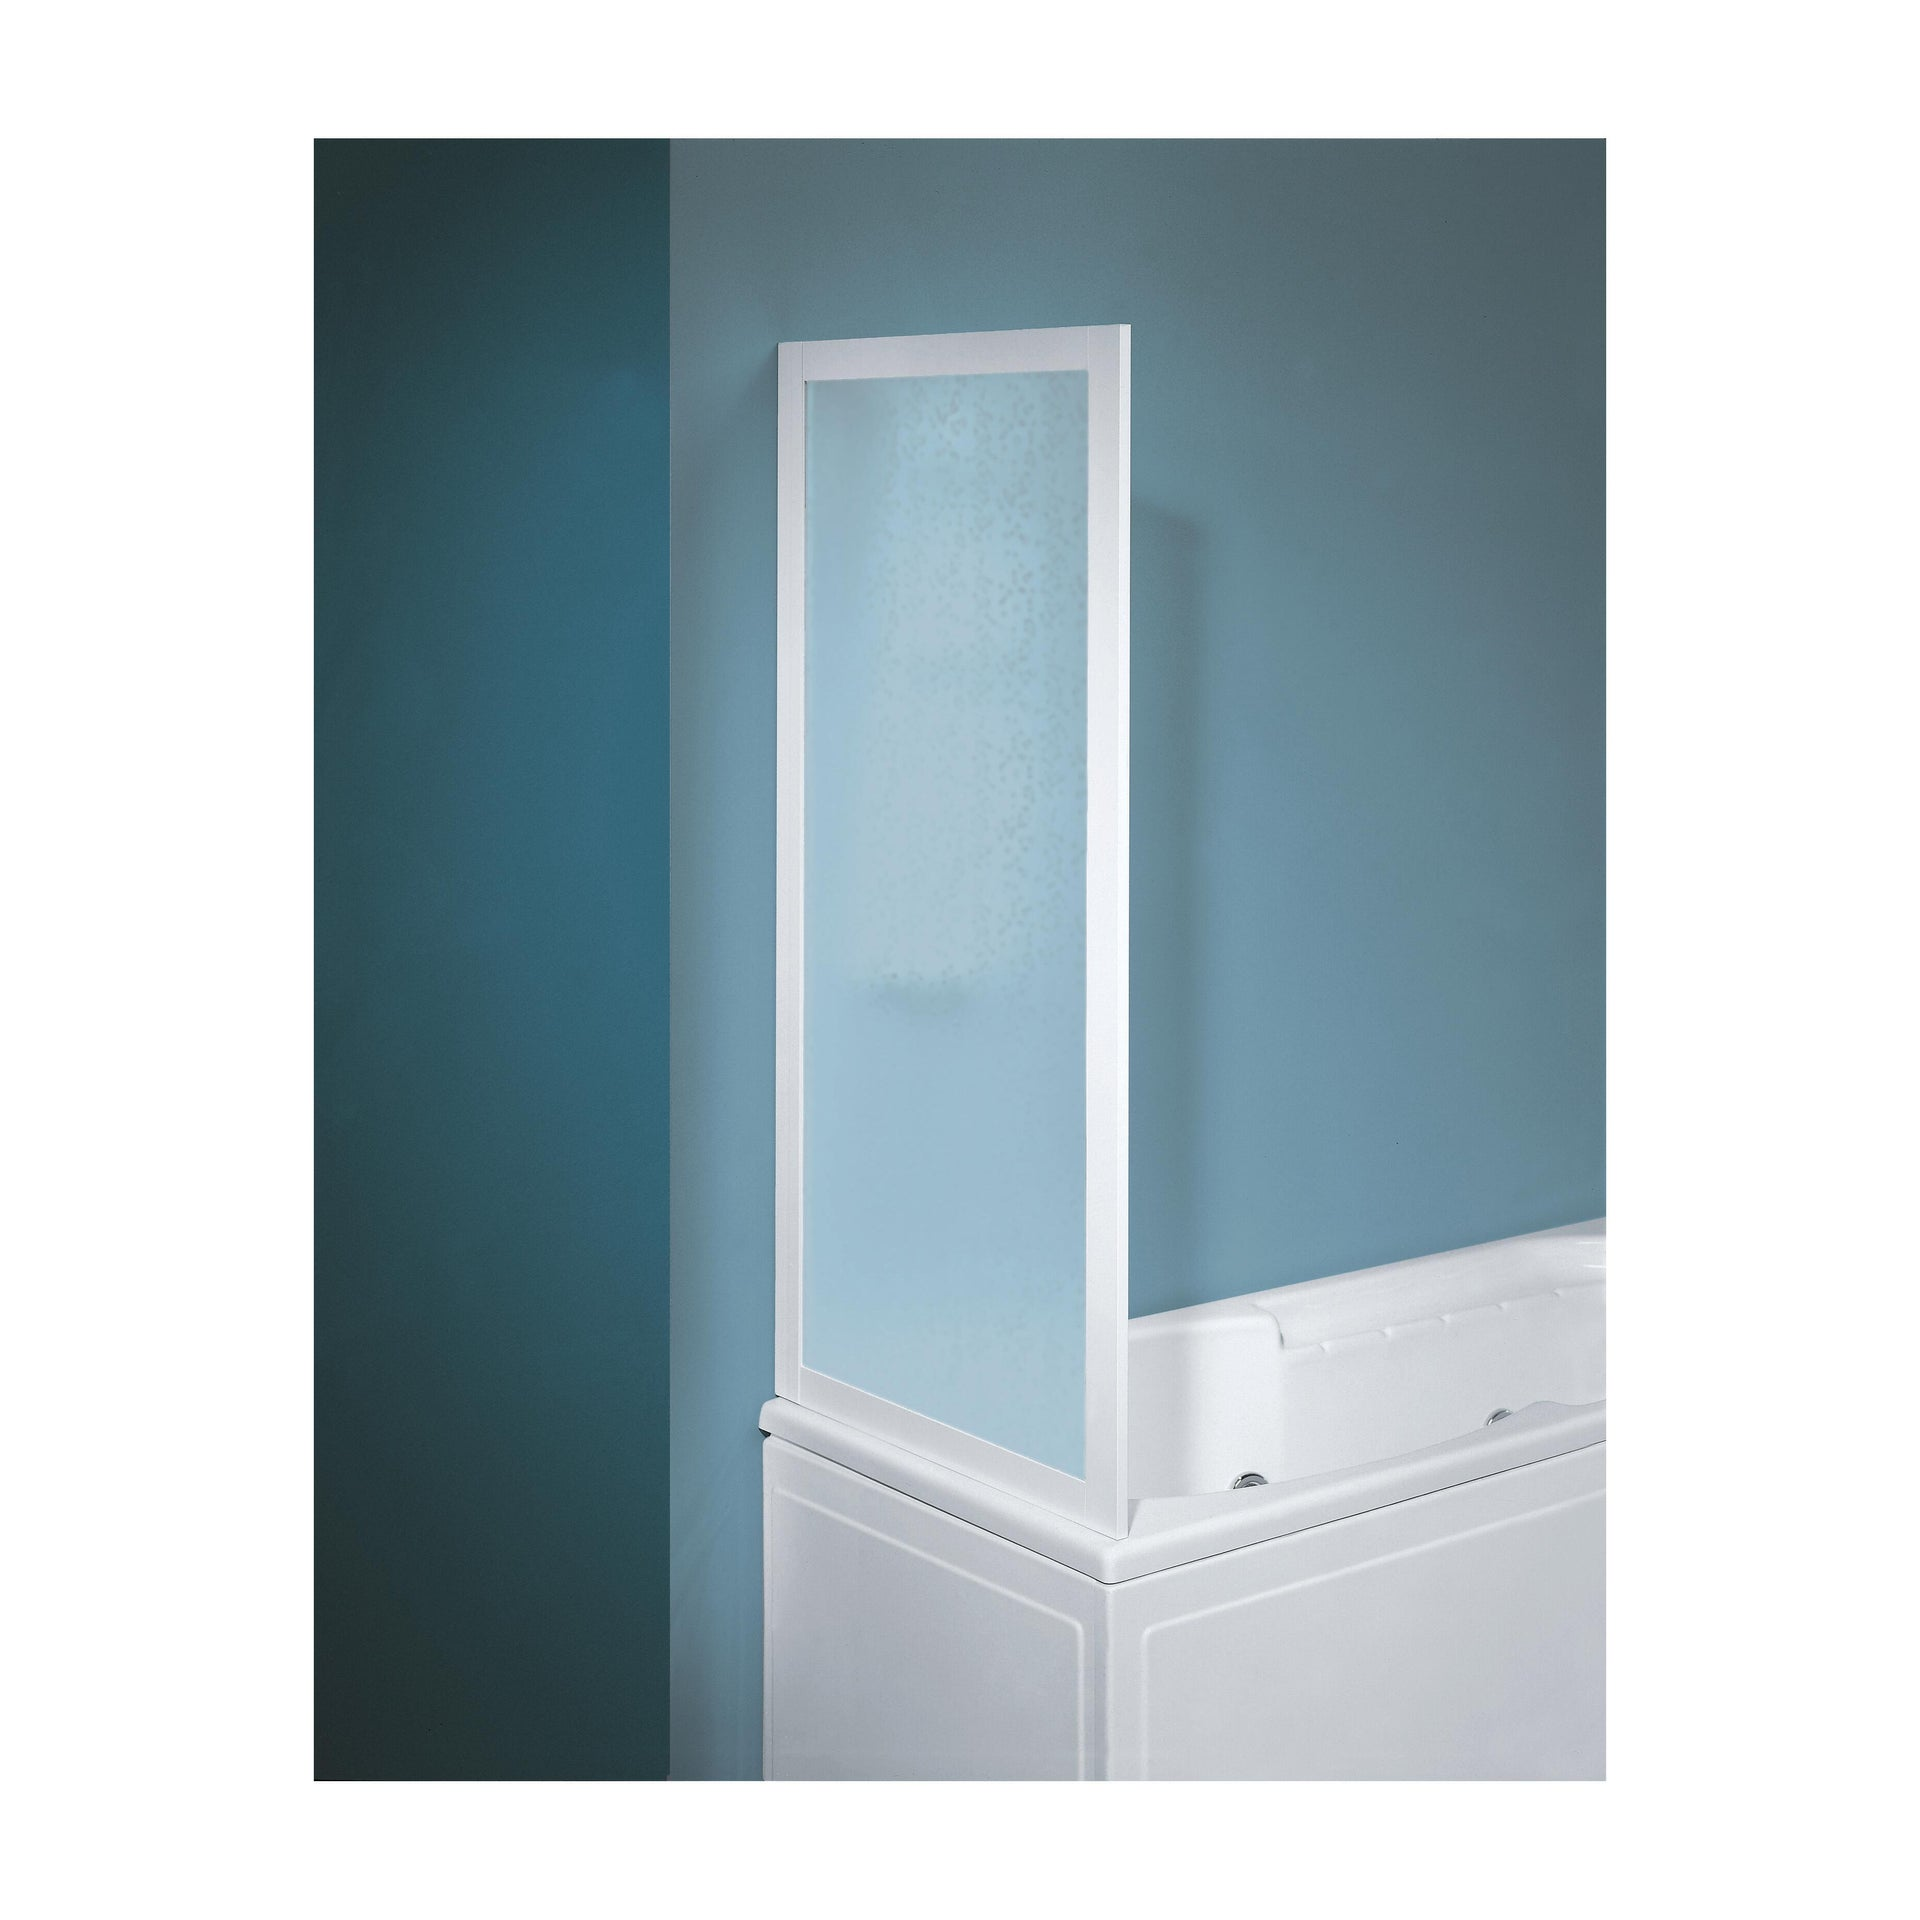 Parete vasca in vetro serigrafato H 135 cm